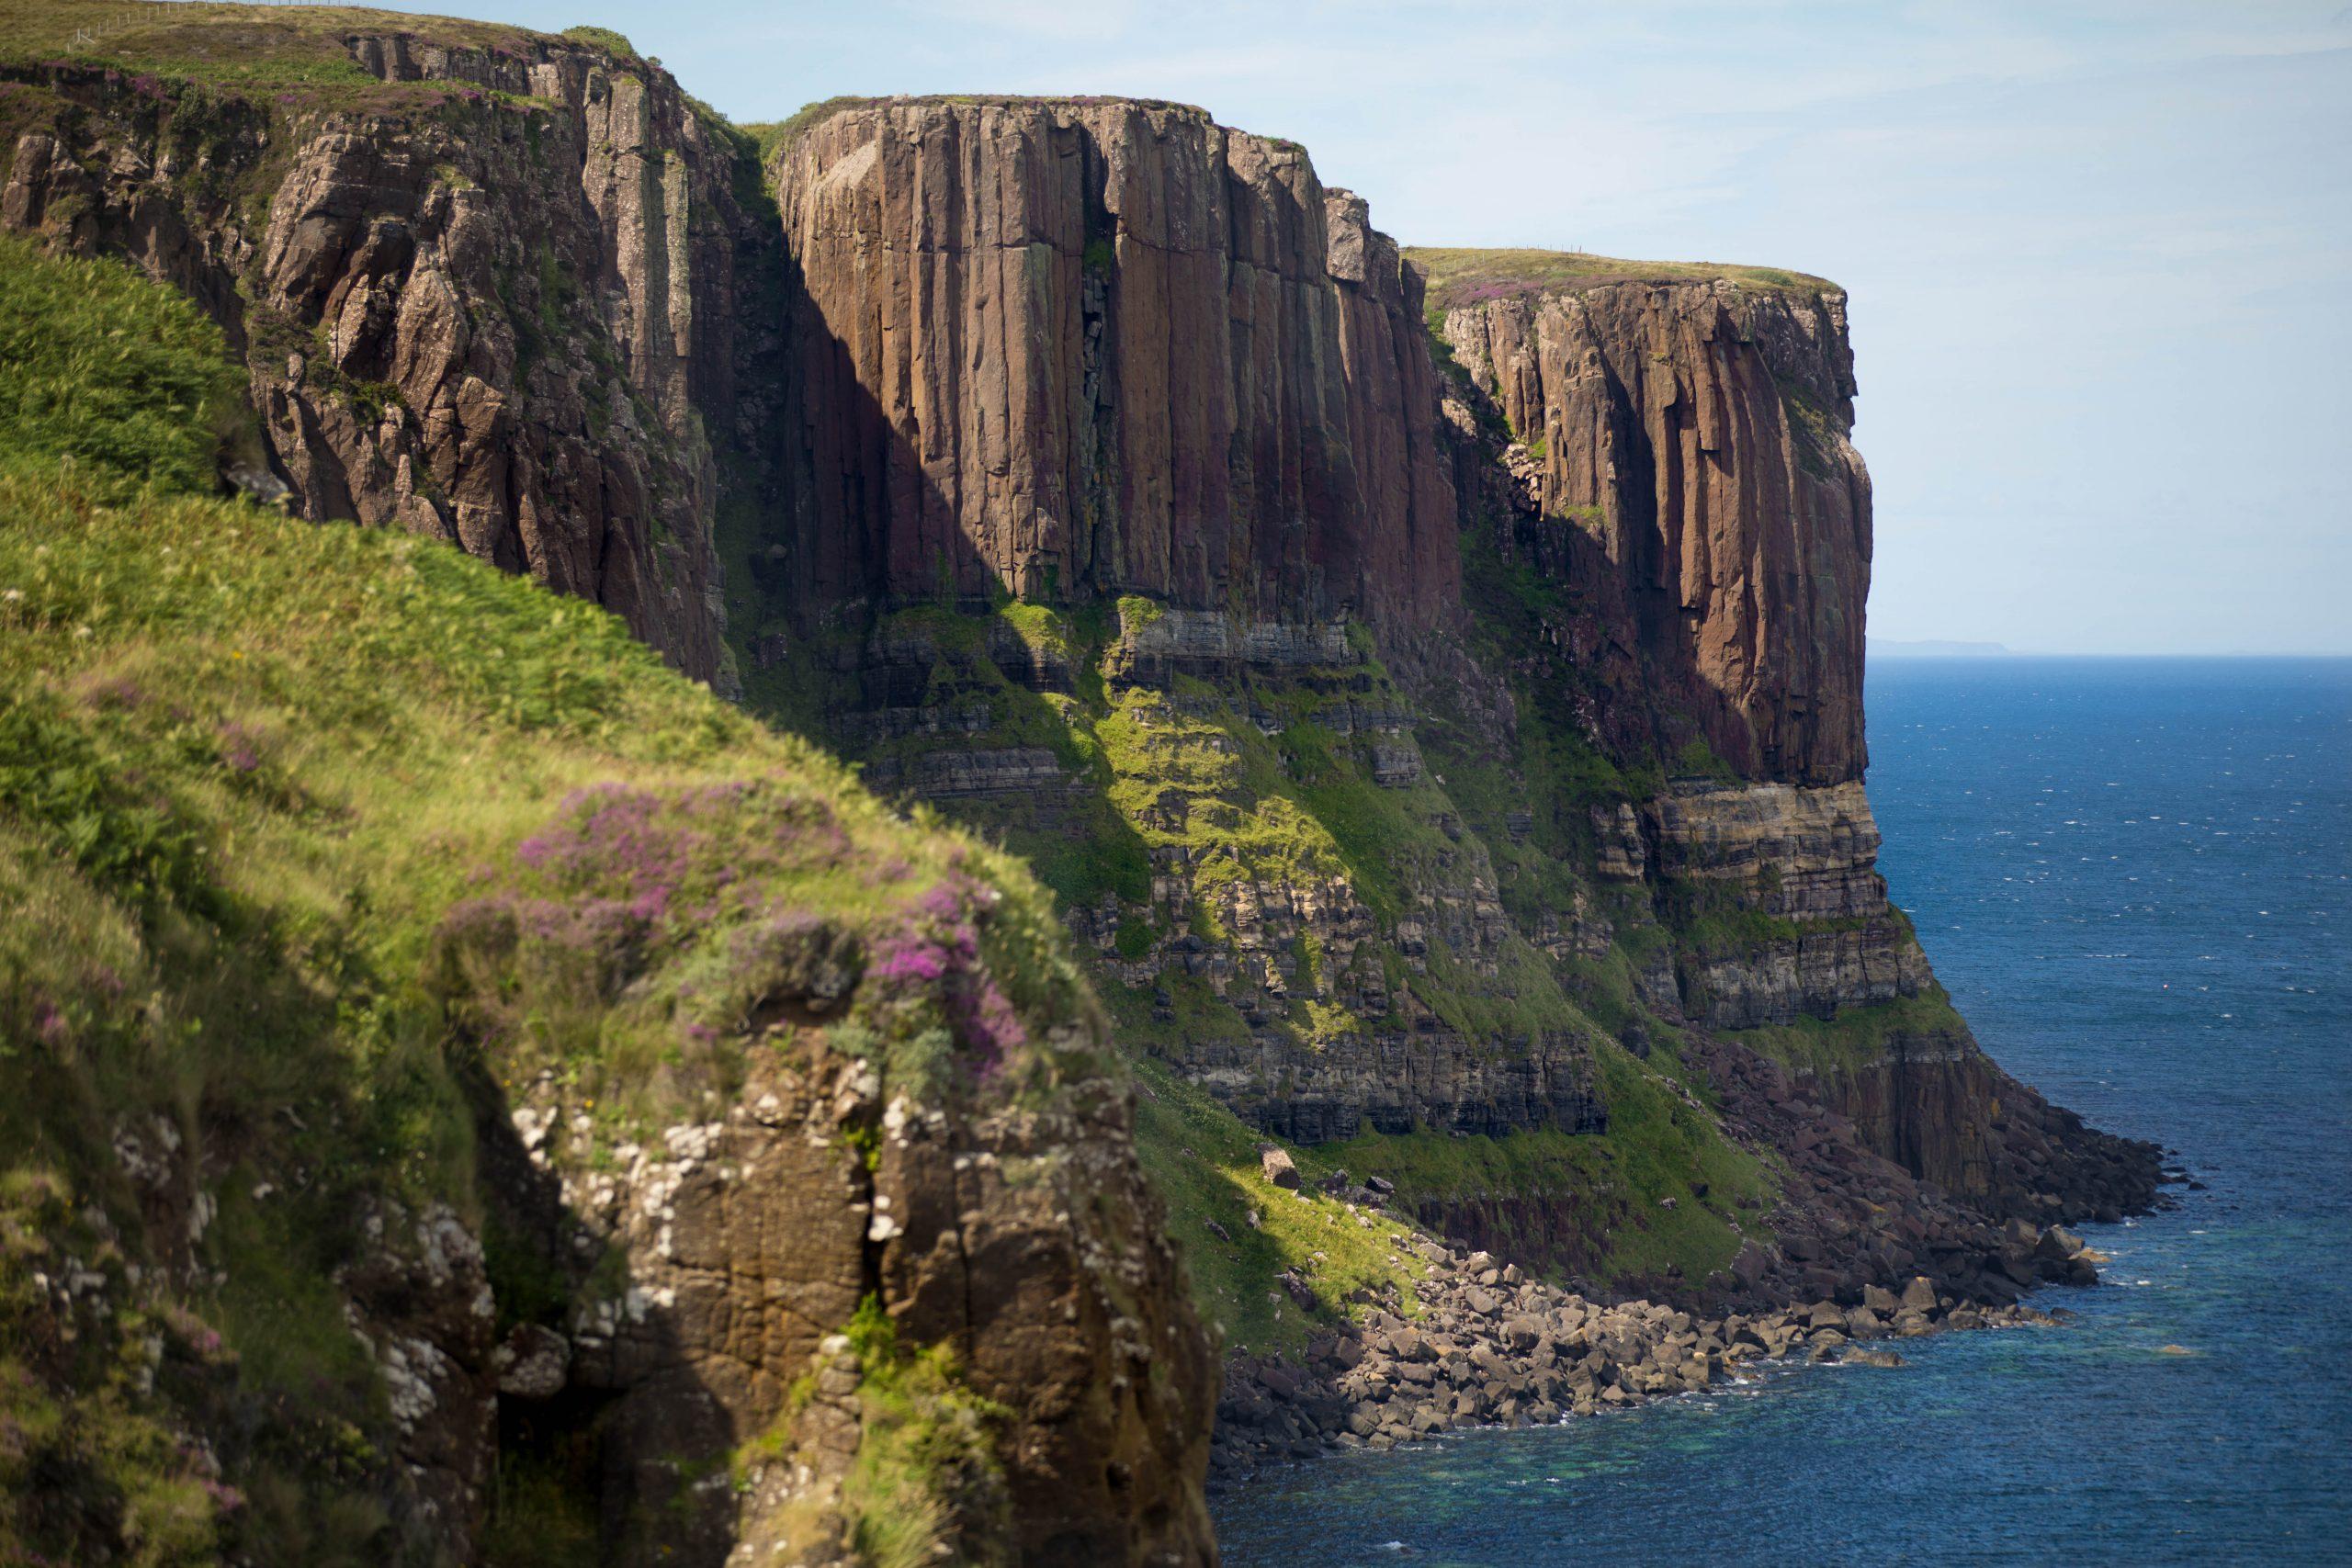 Neist Point Lighthouse Isle of Skye Scotland Highlands by Annie Fairfax